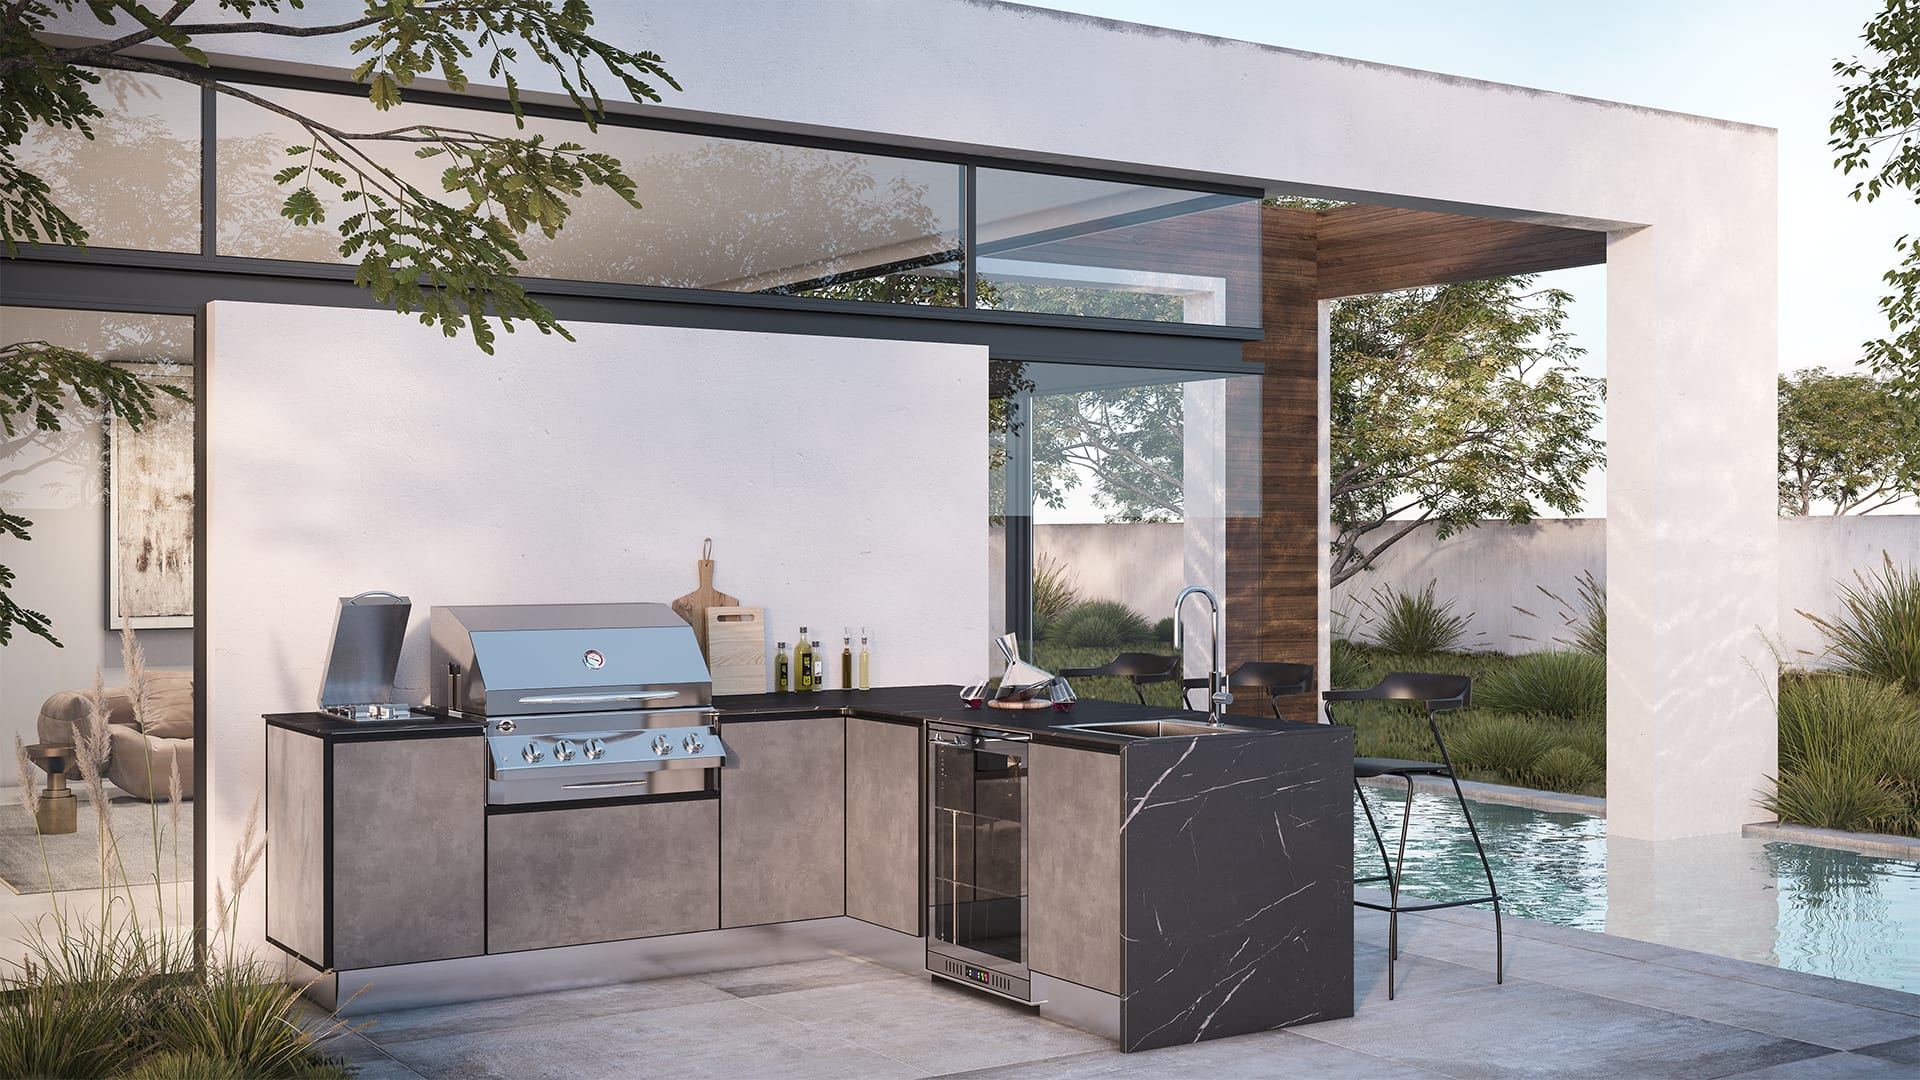 Maayan-Golan_Architectural-Visualization_product-visualization_outdoor-kitchen_alumex-by-formex_katlav-kitchen_03